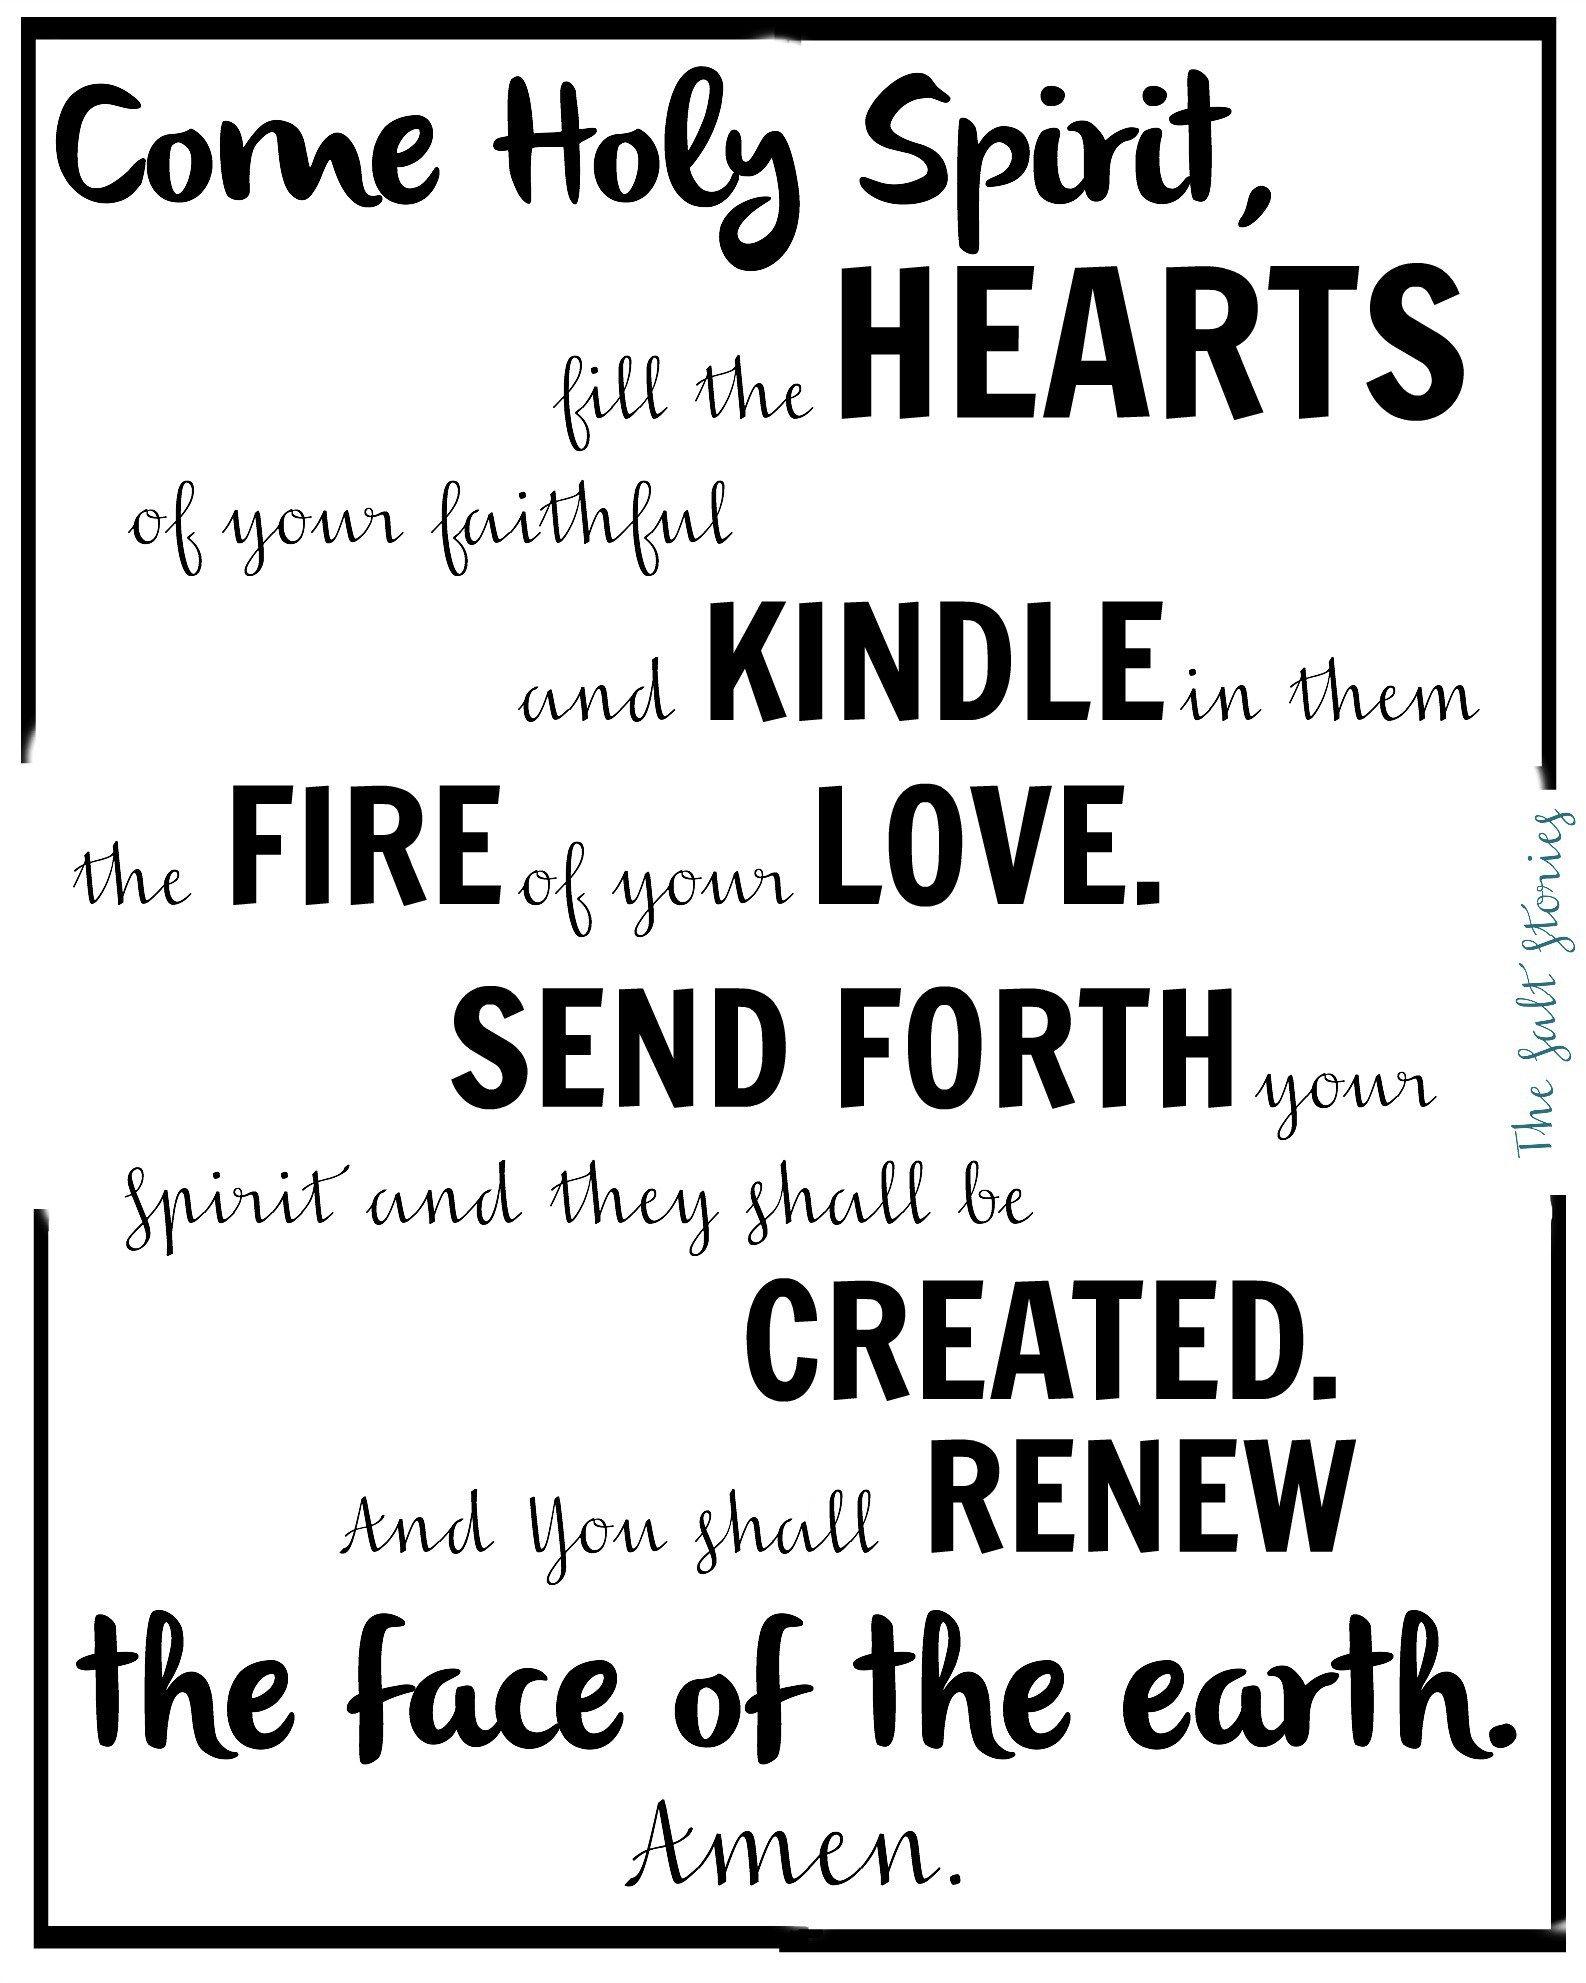 graphic regarding Come Holy Spirit Prayer Printable known as Arrive Holy Spirit.. Inside Remembrance @The Salt Studies